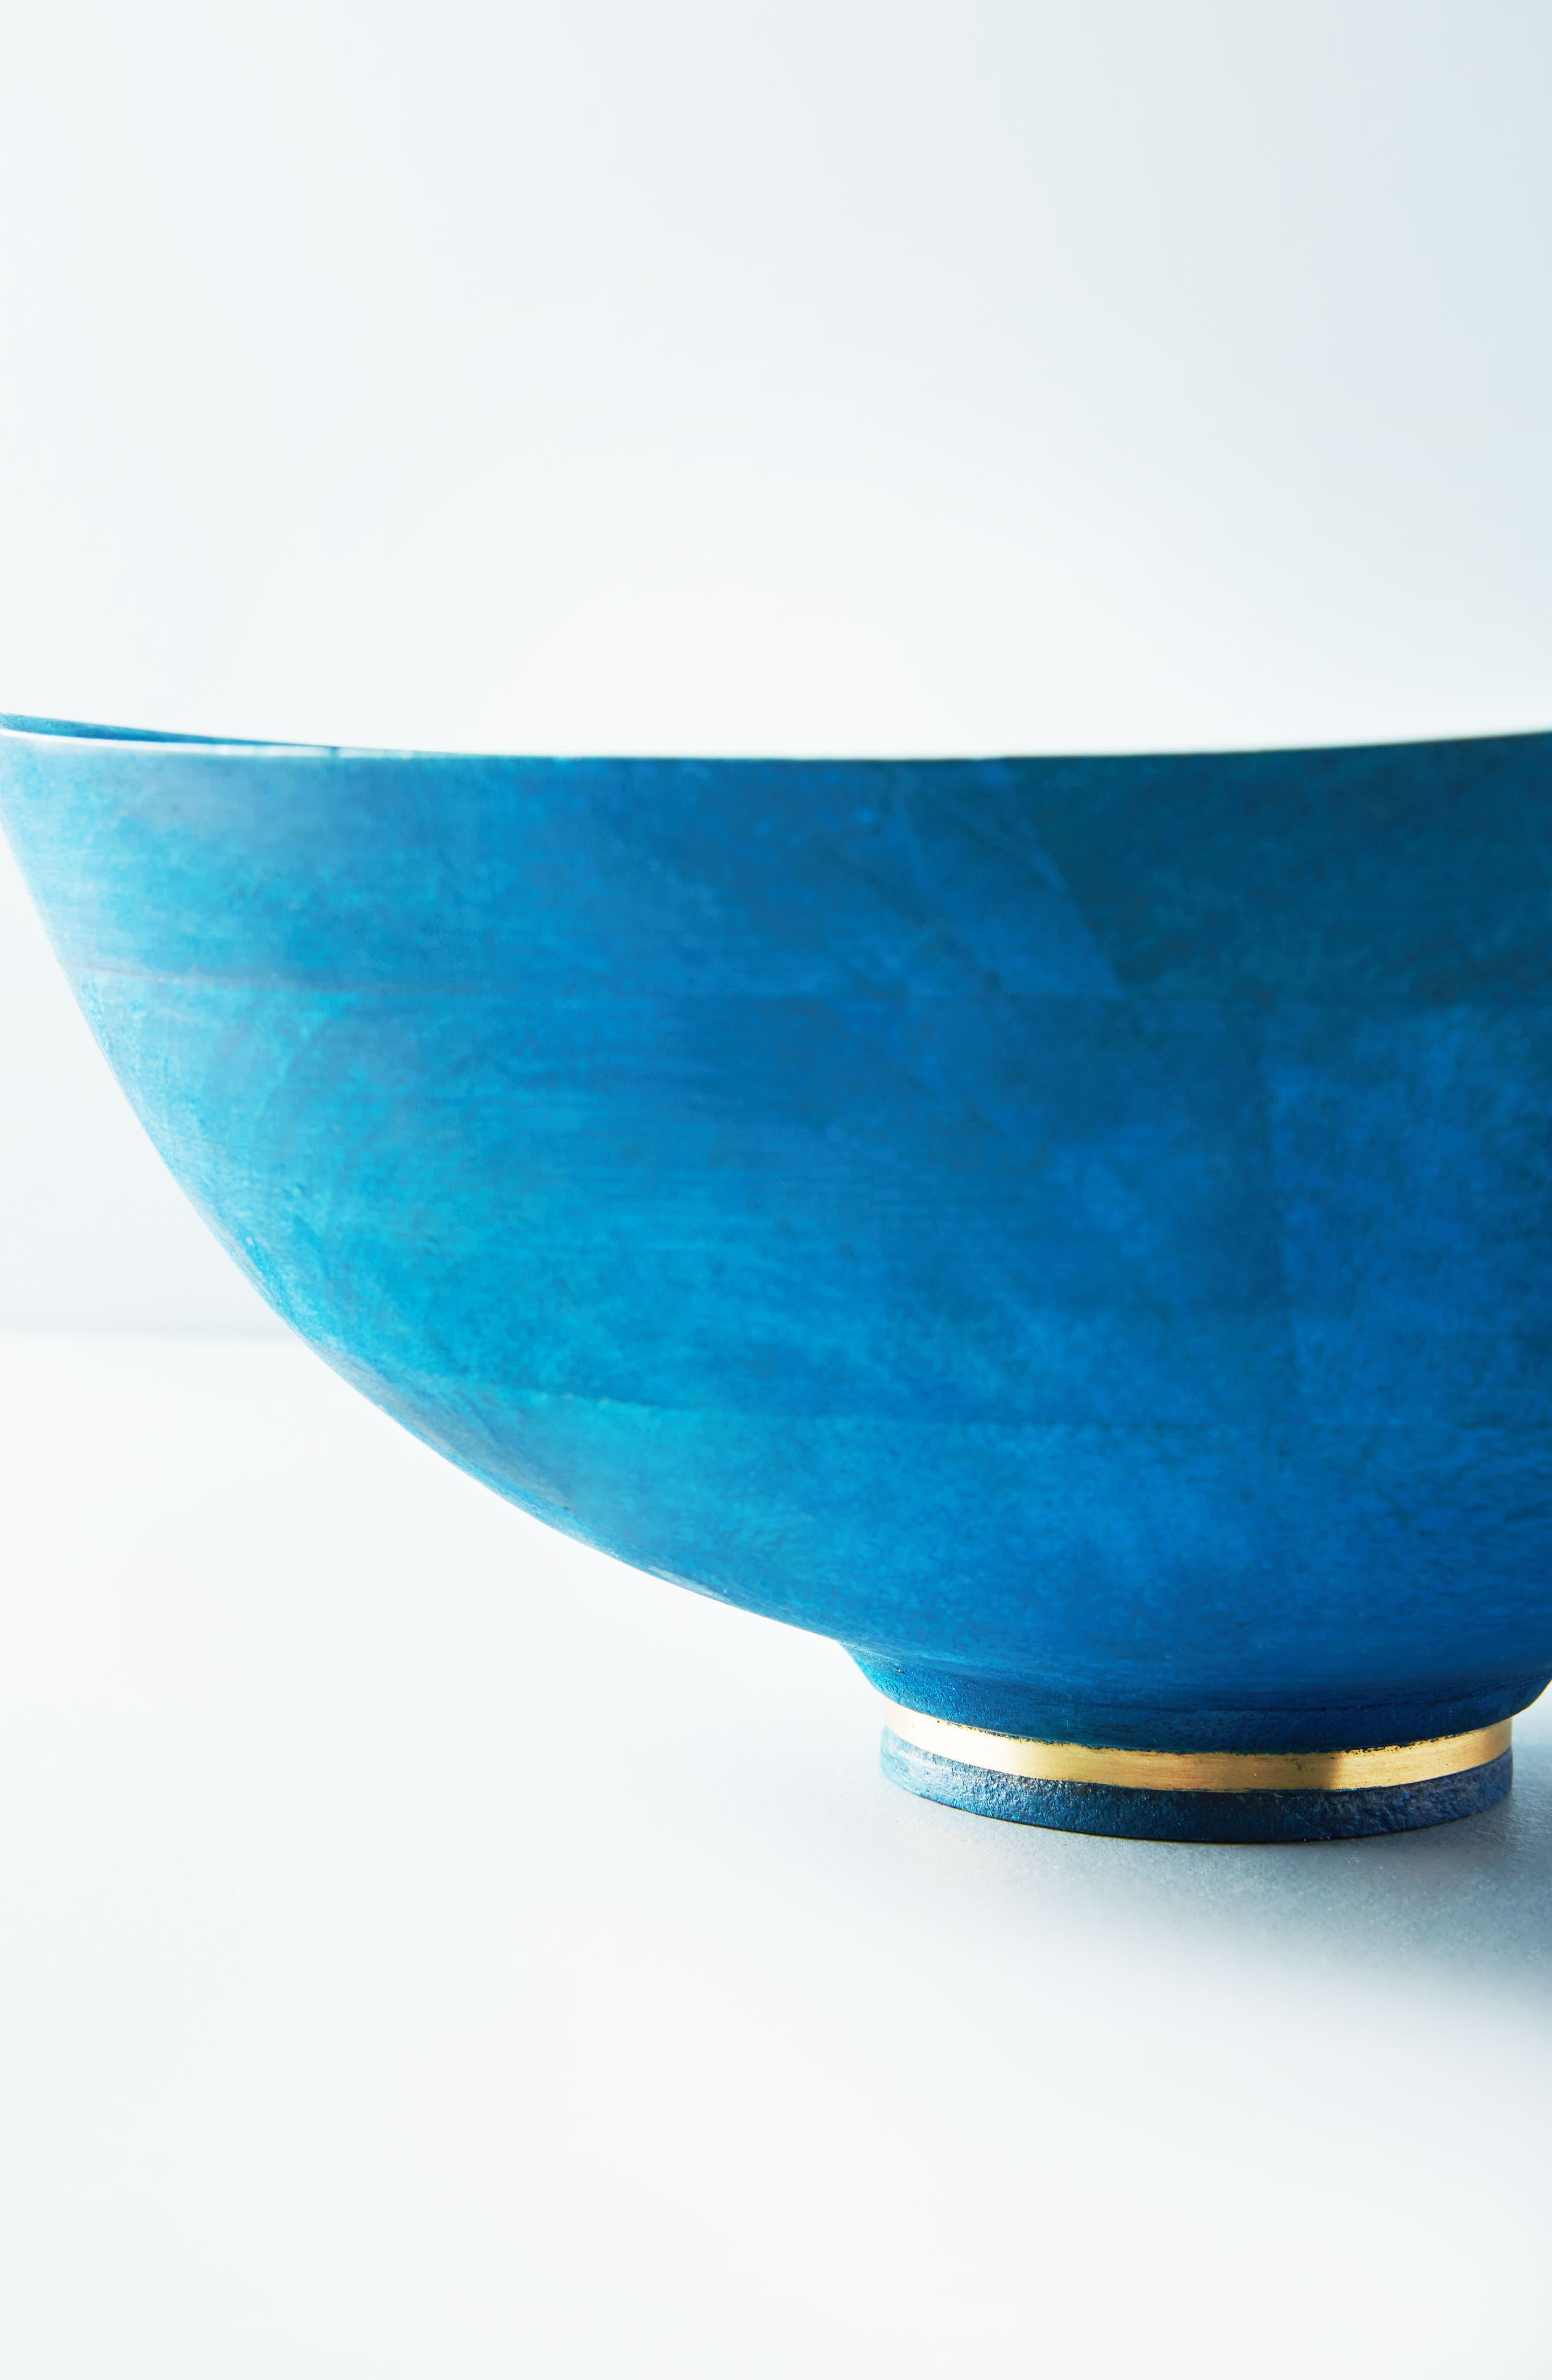 Hearthside Wood Serving Bowl,                             Alternate thumbnail 2, color,                             400